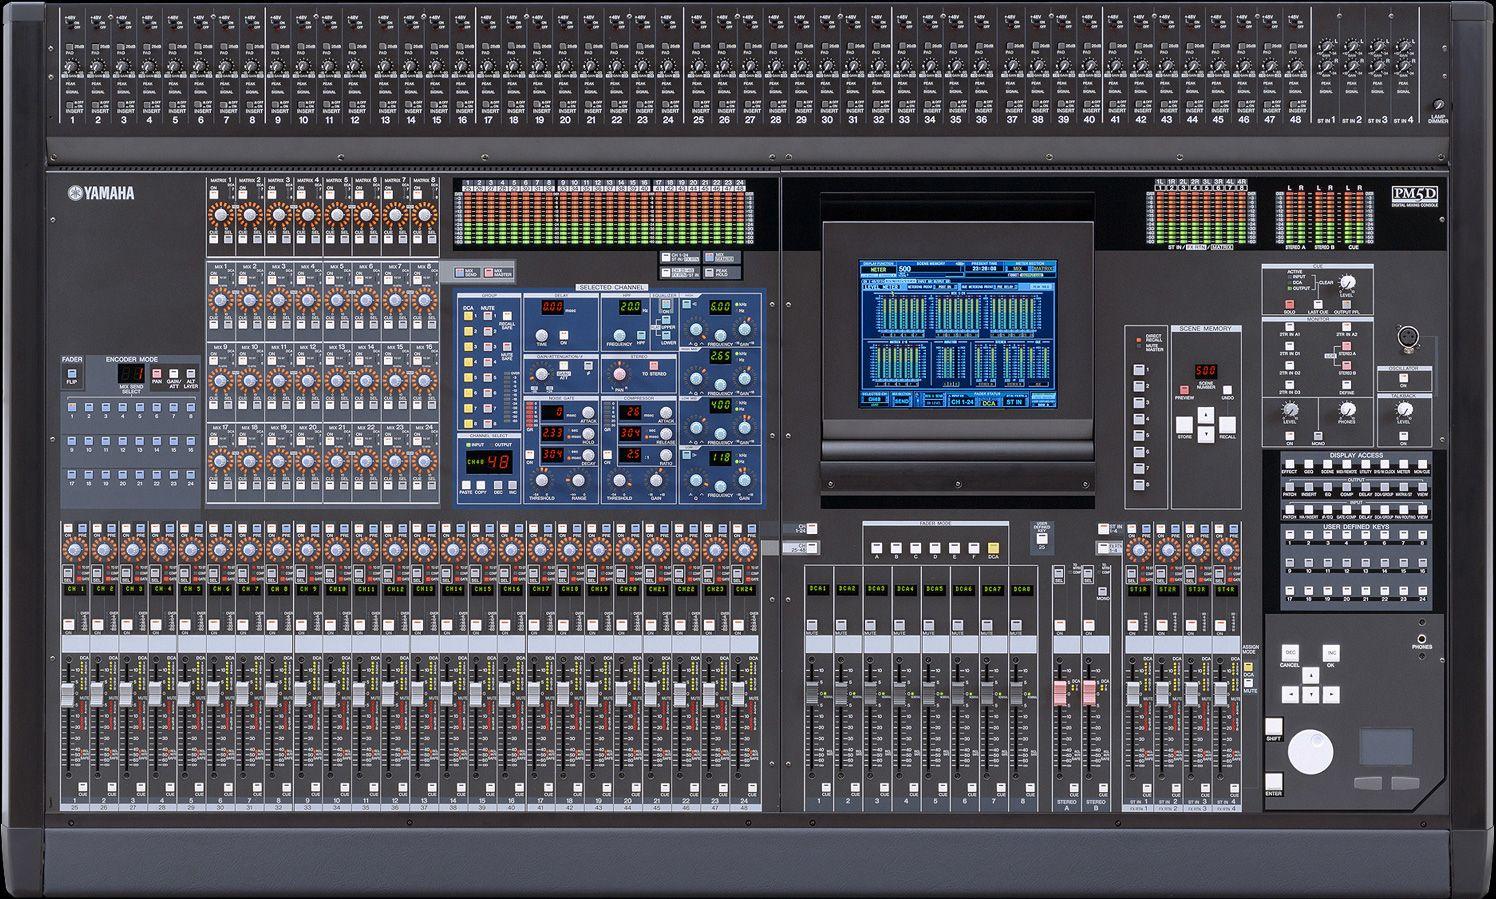 Audio Mixer Circuit Board Images Audio Mixer Circuit Board